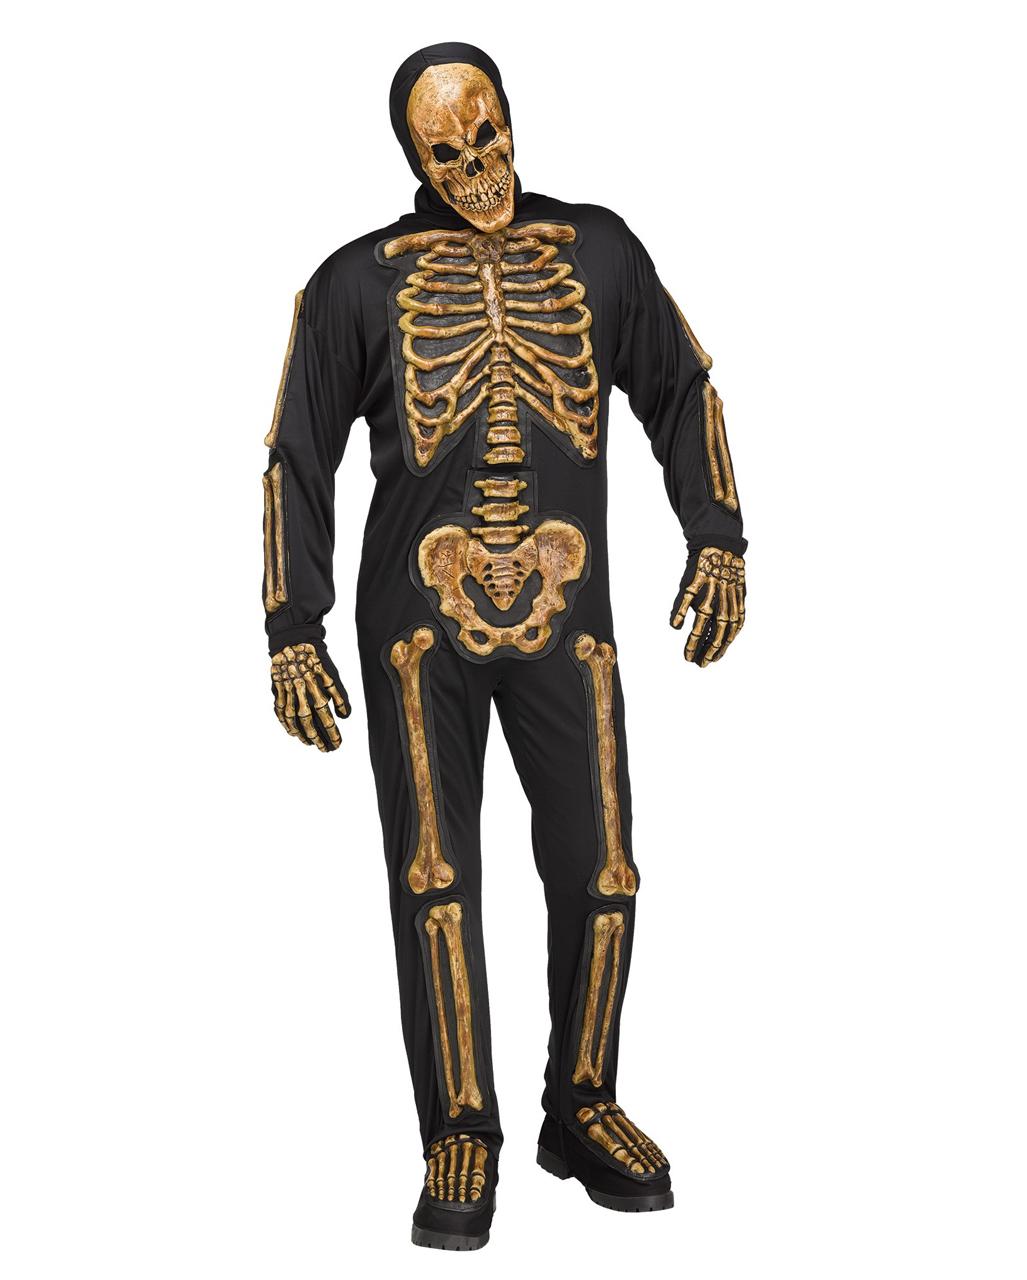 verwestes skelett kost m mit knochen f r halloween karneval universe. Black Bedroom Furniture Sets. Home Design Ideas